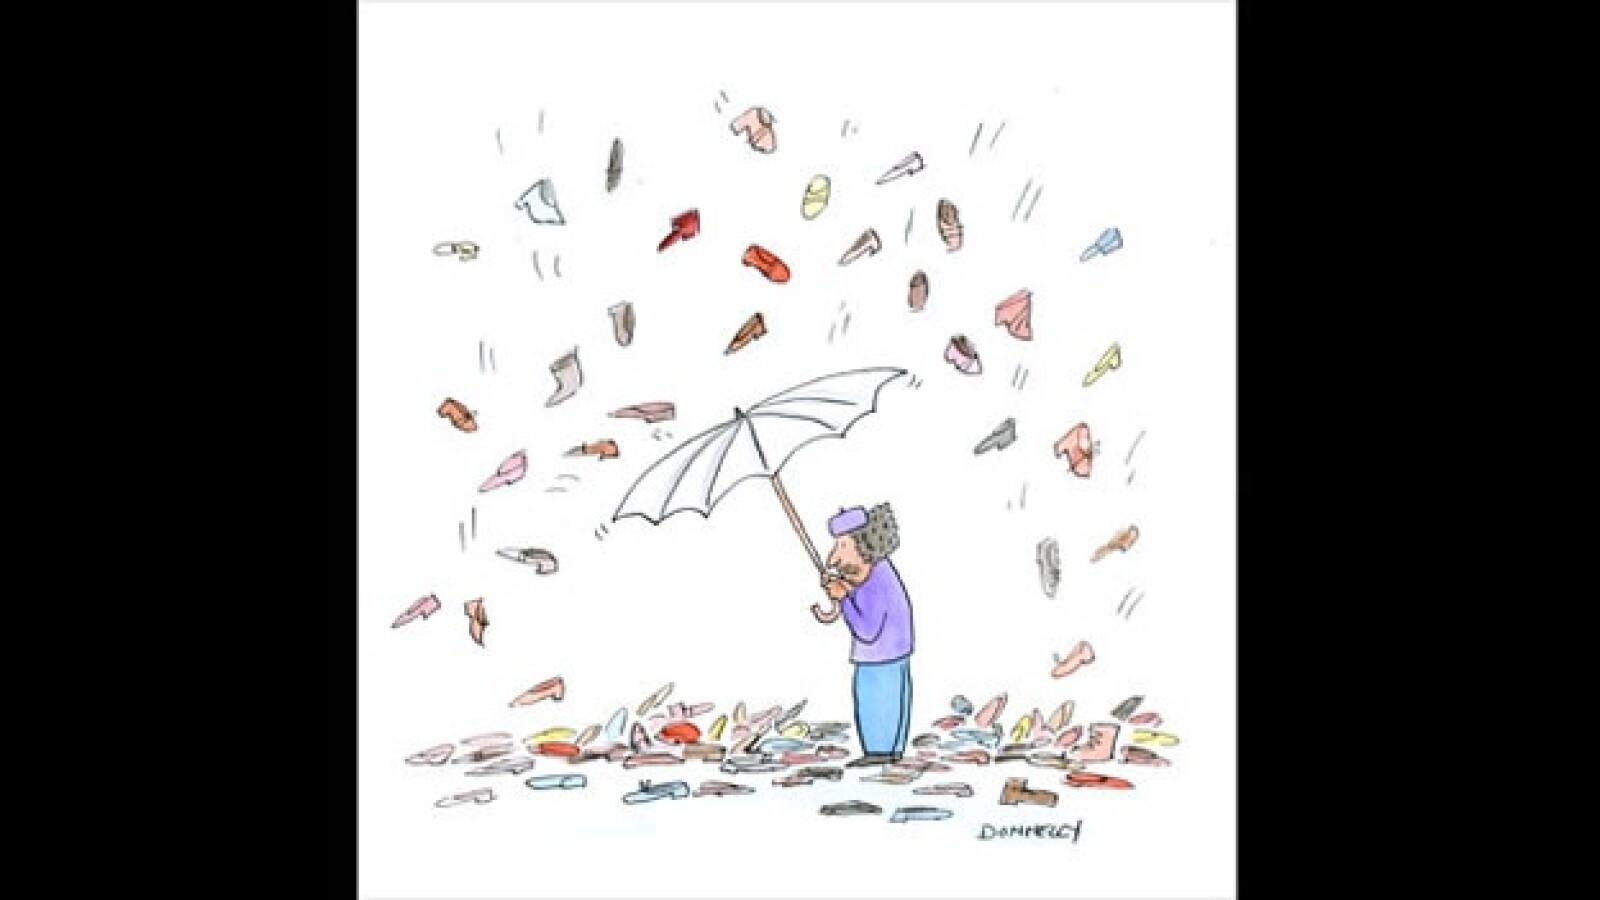 Gadhafi - caricatura - Liza Donnelly